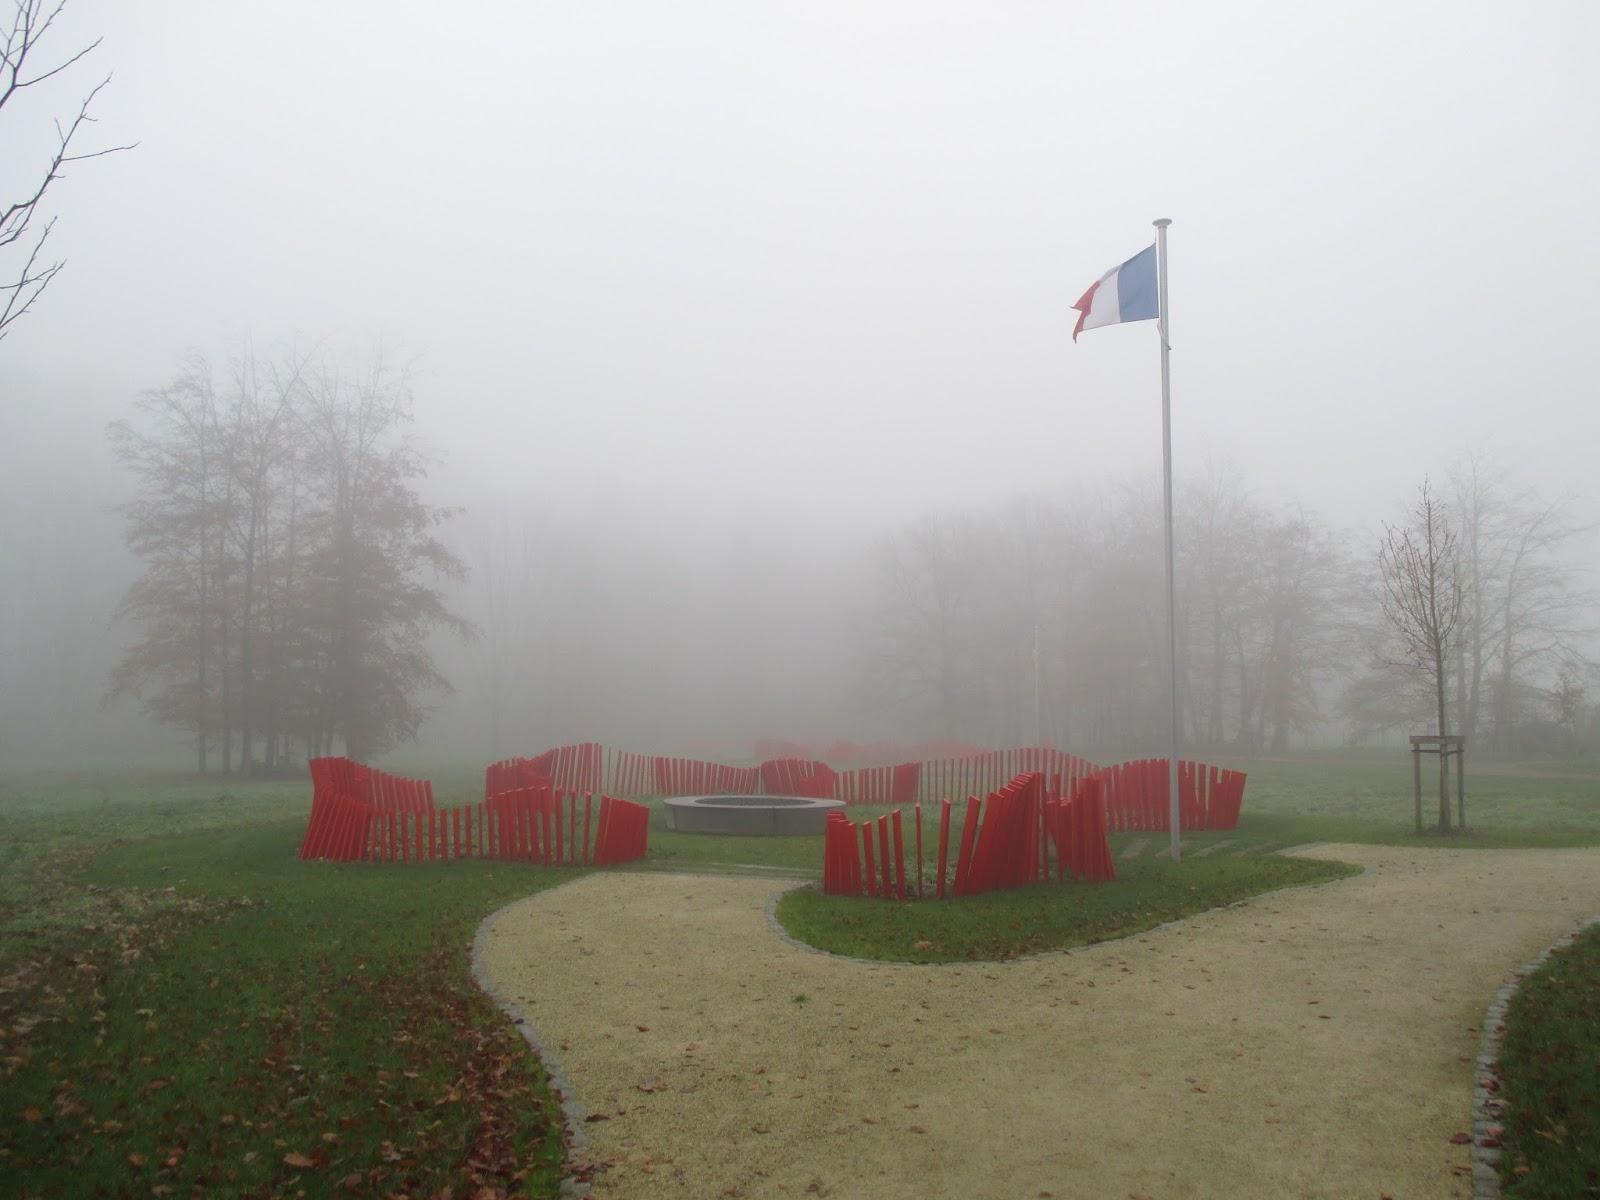 Passchendaele Memorial Park